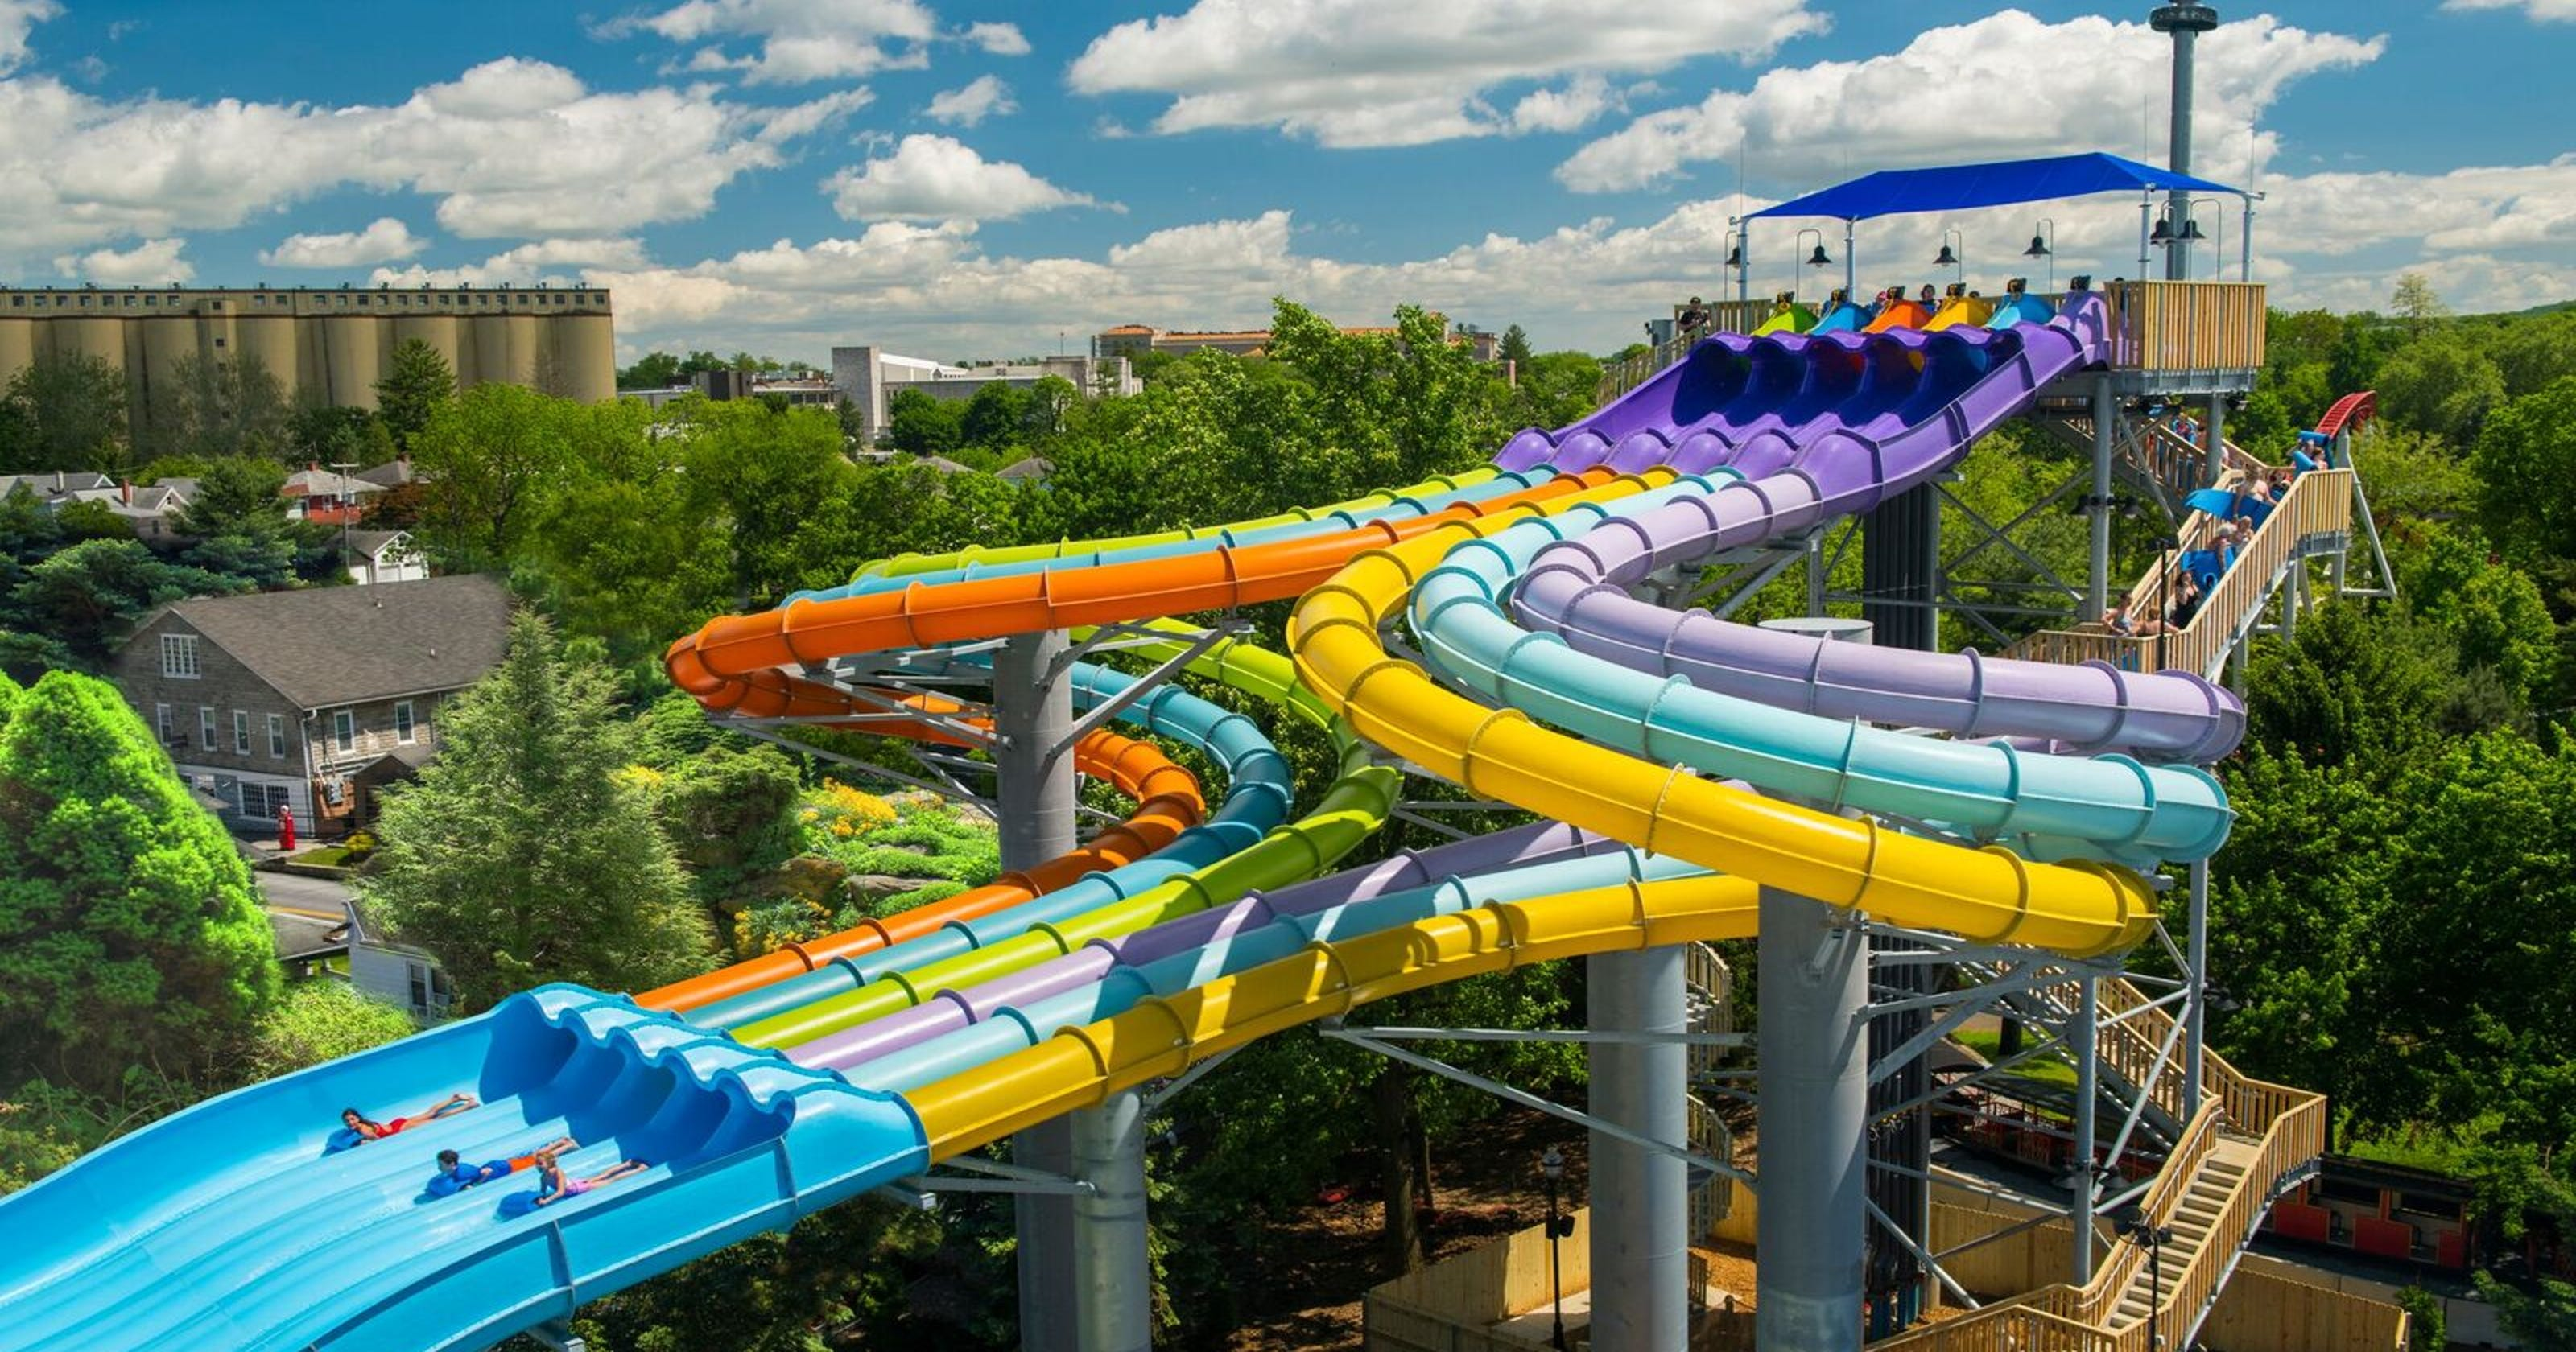 Hersheypark Deals 2018 | Lamoureph Blog